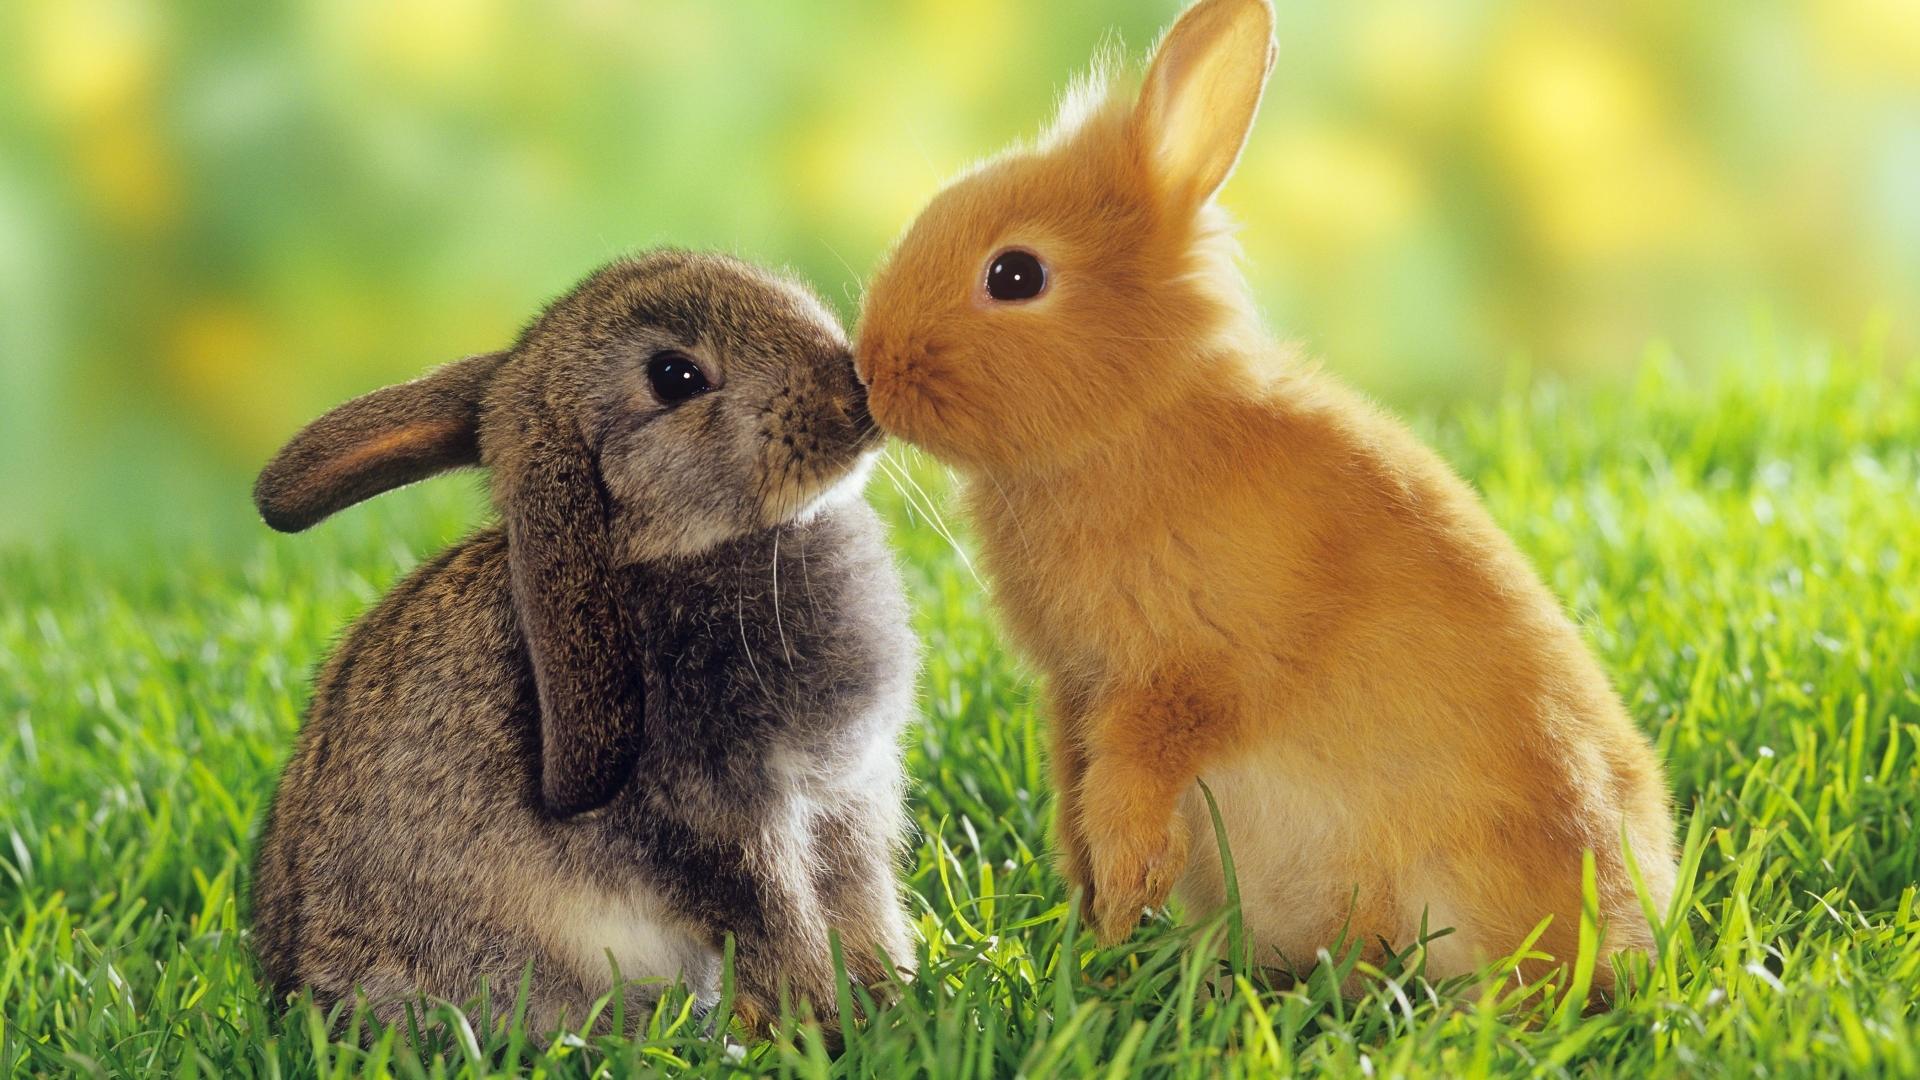 Cute Rabbit Wallpaper theme